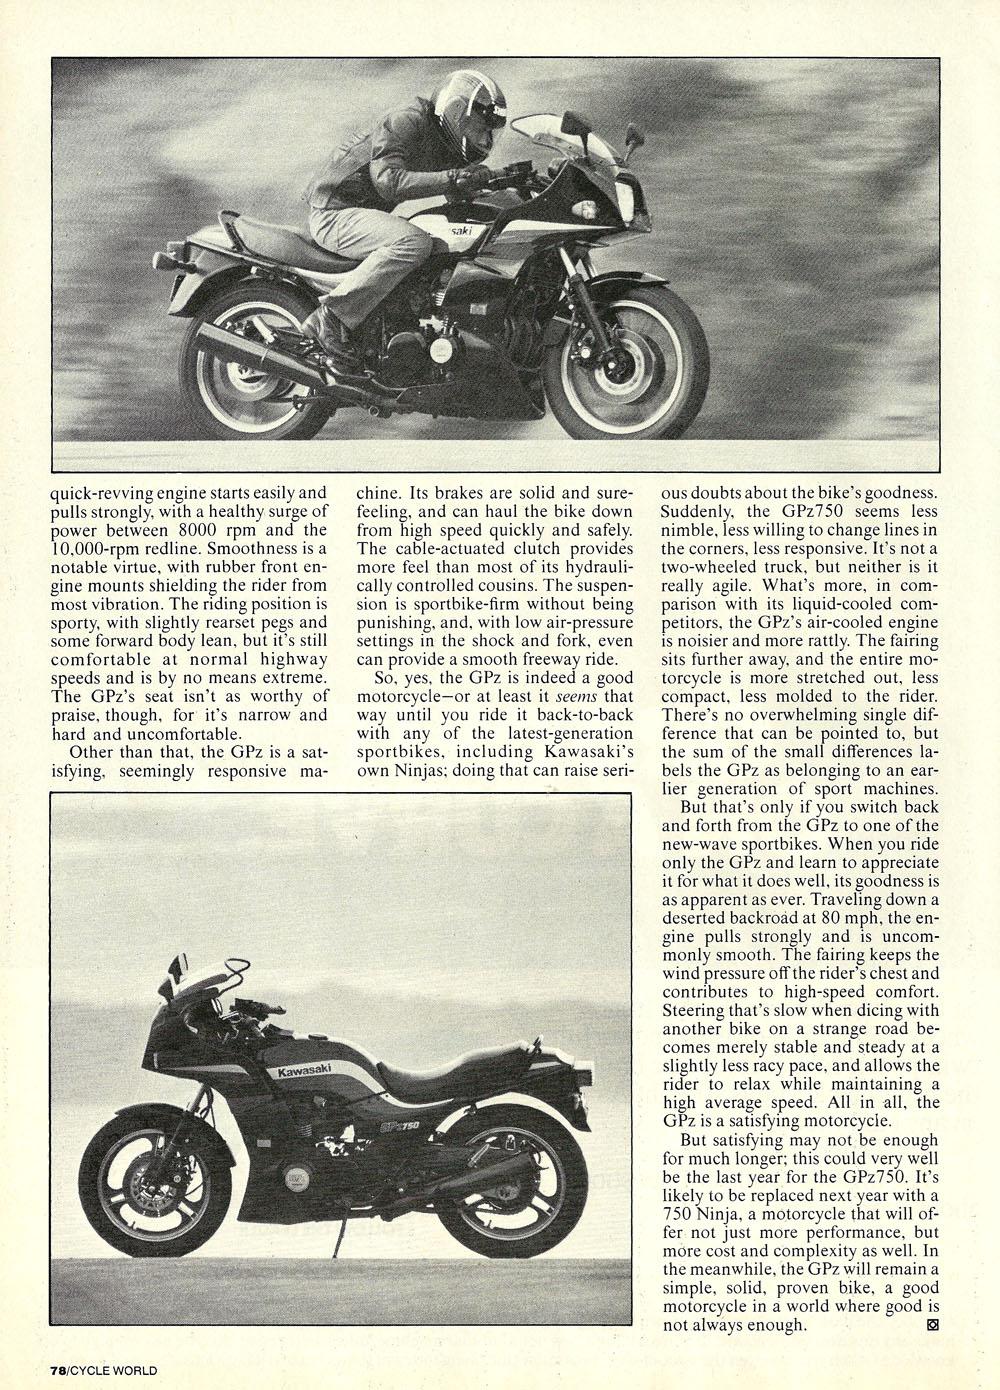 1985 Kawasaki GPz750 road test 03.jpg